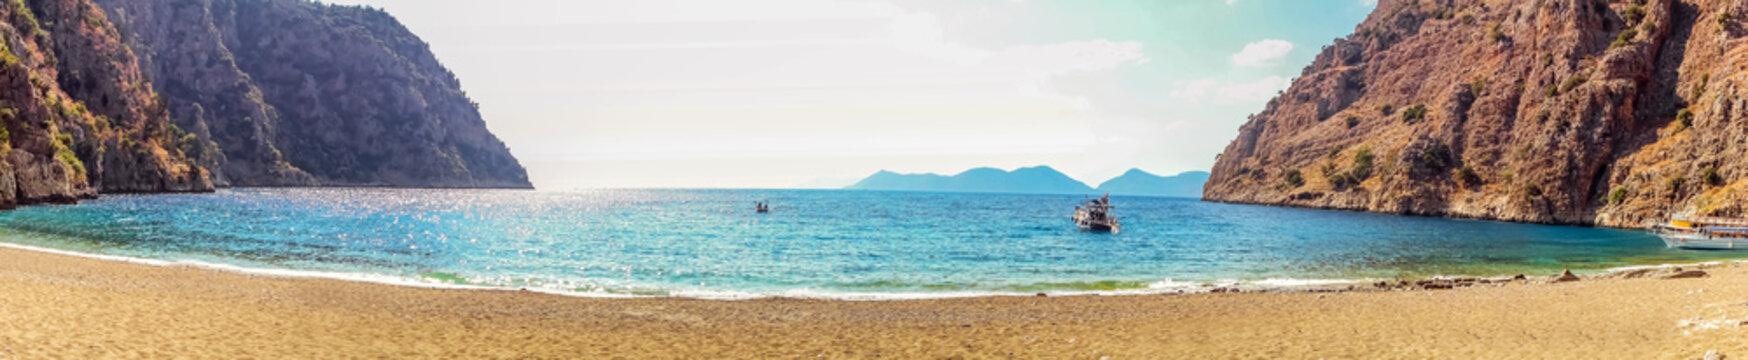 Panorama paradise in Turkeys Butterfly Valley sea beach